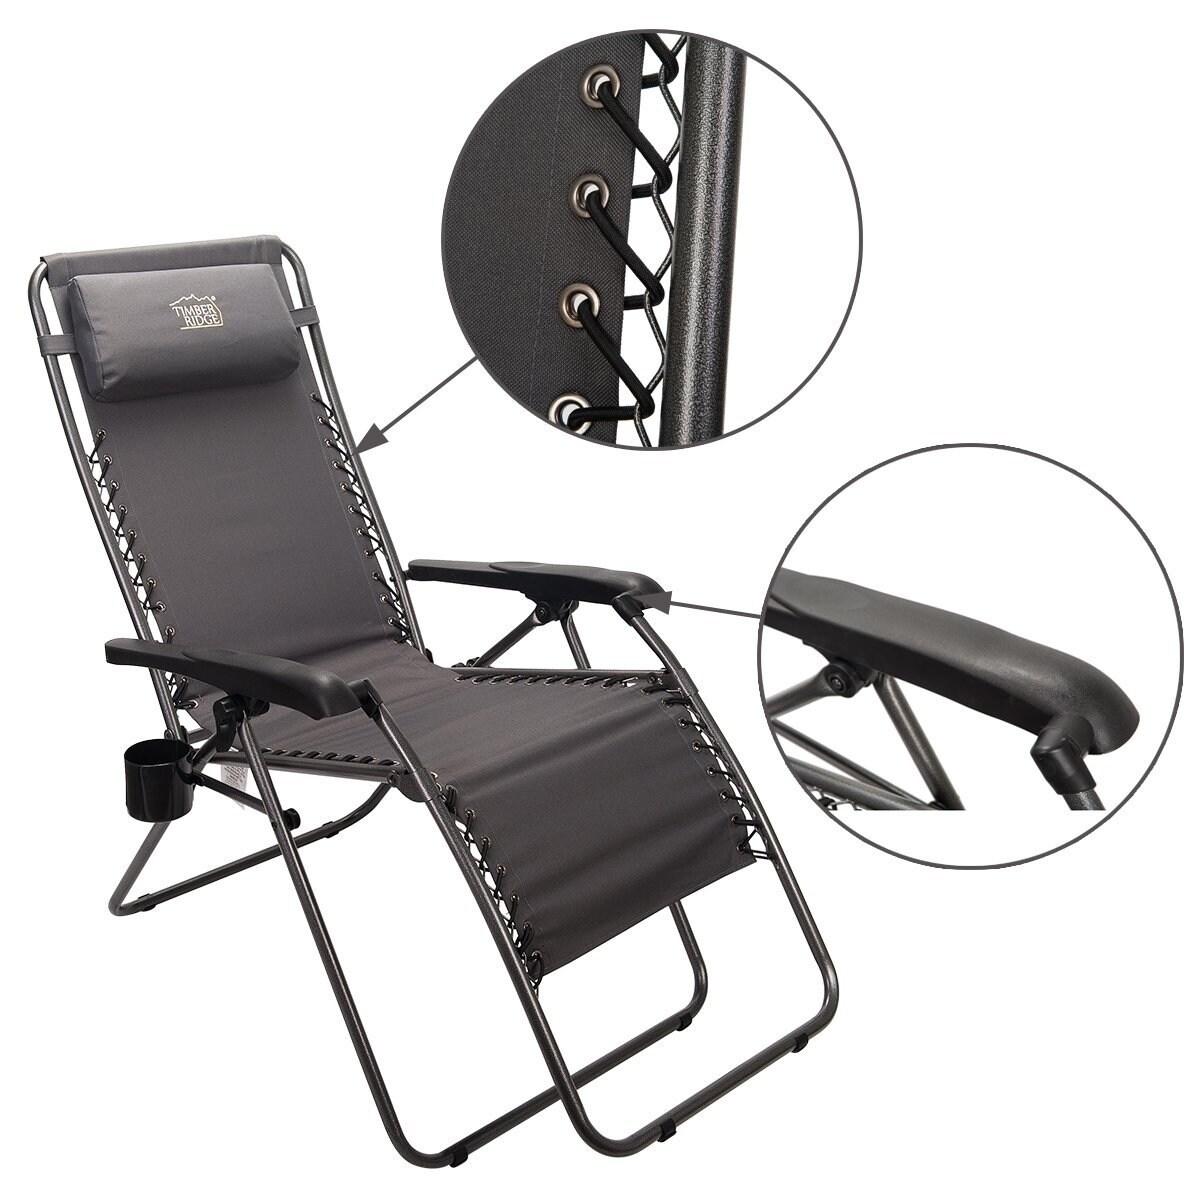 Groovy Timber Ridge Zero Gravity Lounge Chair Patio Recliner Supports 300Lbs Creativecarmelina Interior Chair Design Creativecarmelinacom